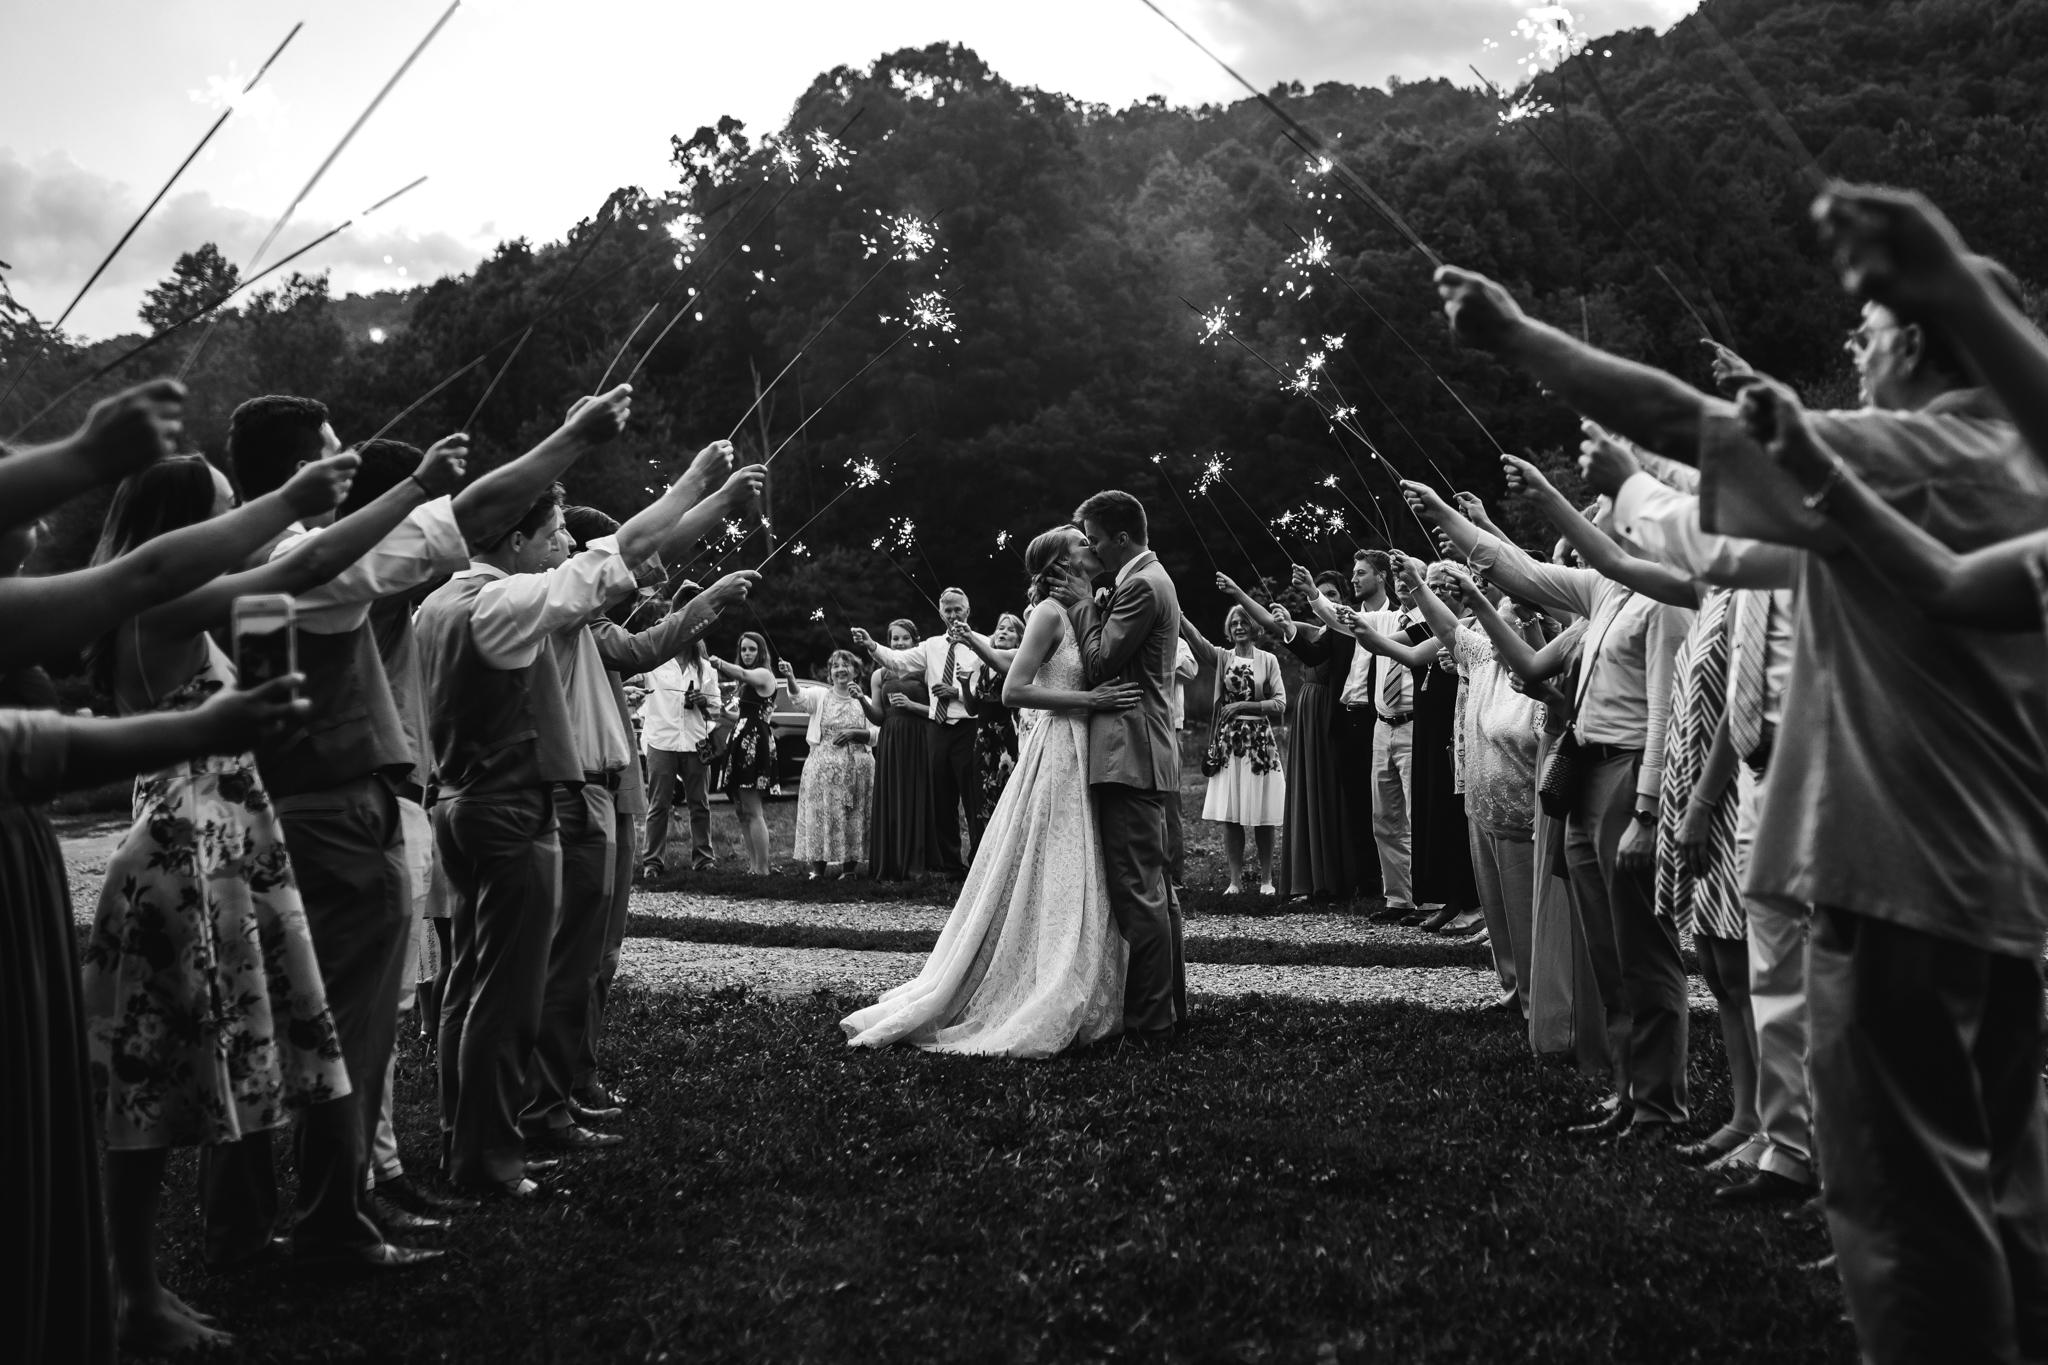 ashville-wedding-photographers-thewarmtharoundyou--backyard-asheville-wedding-mountain-wedding (234 of 244).jpg